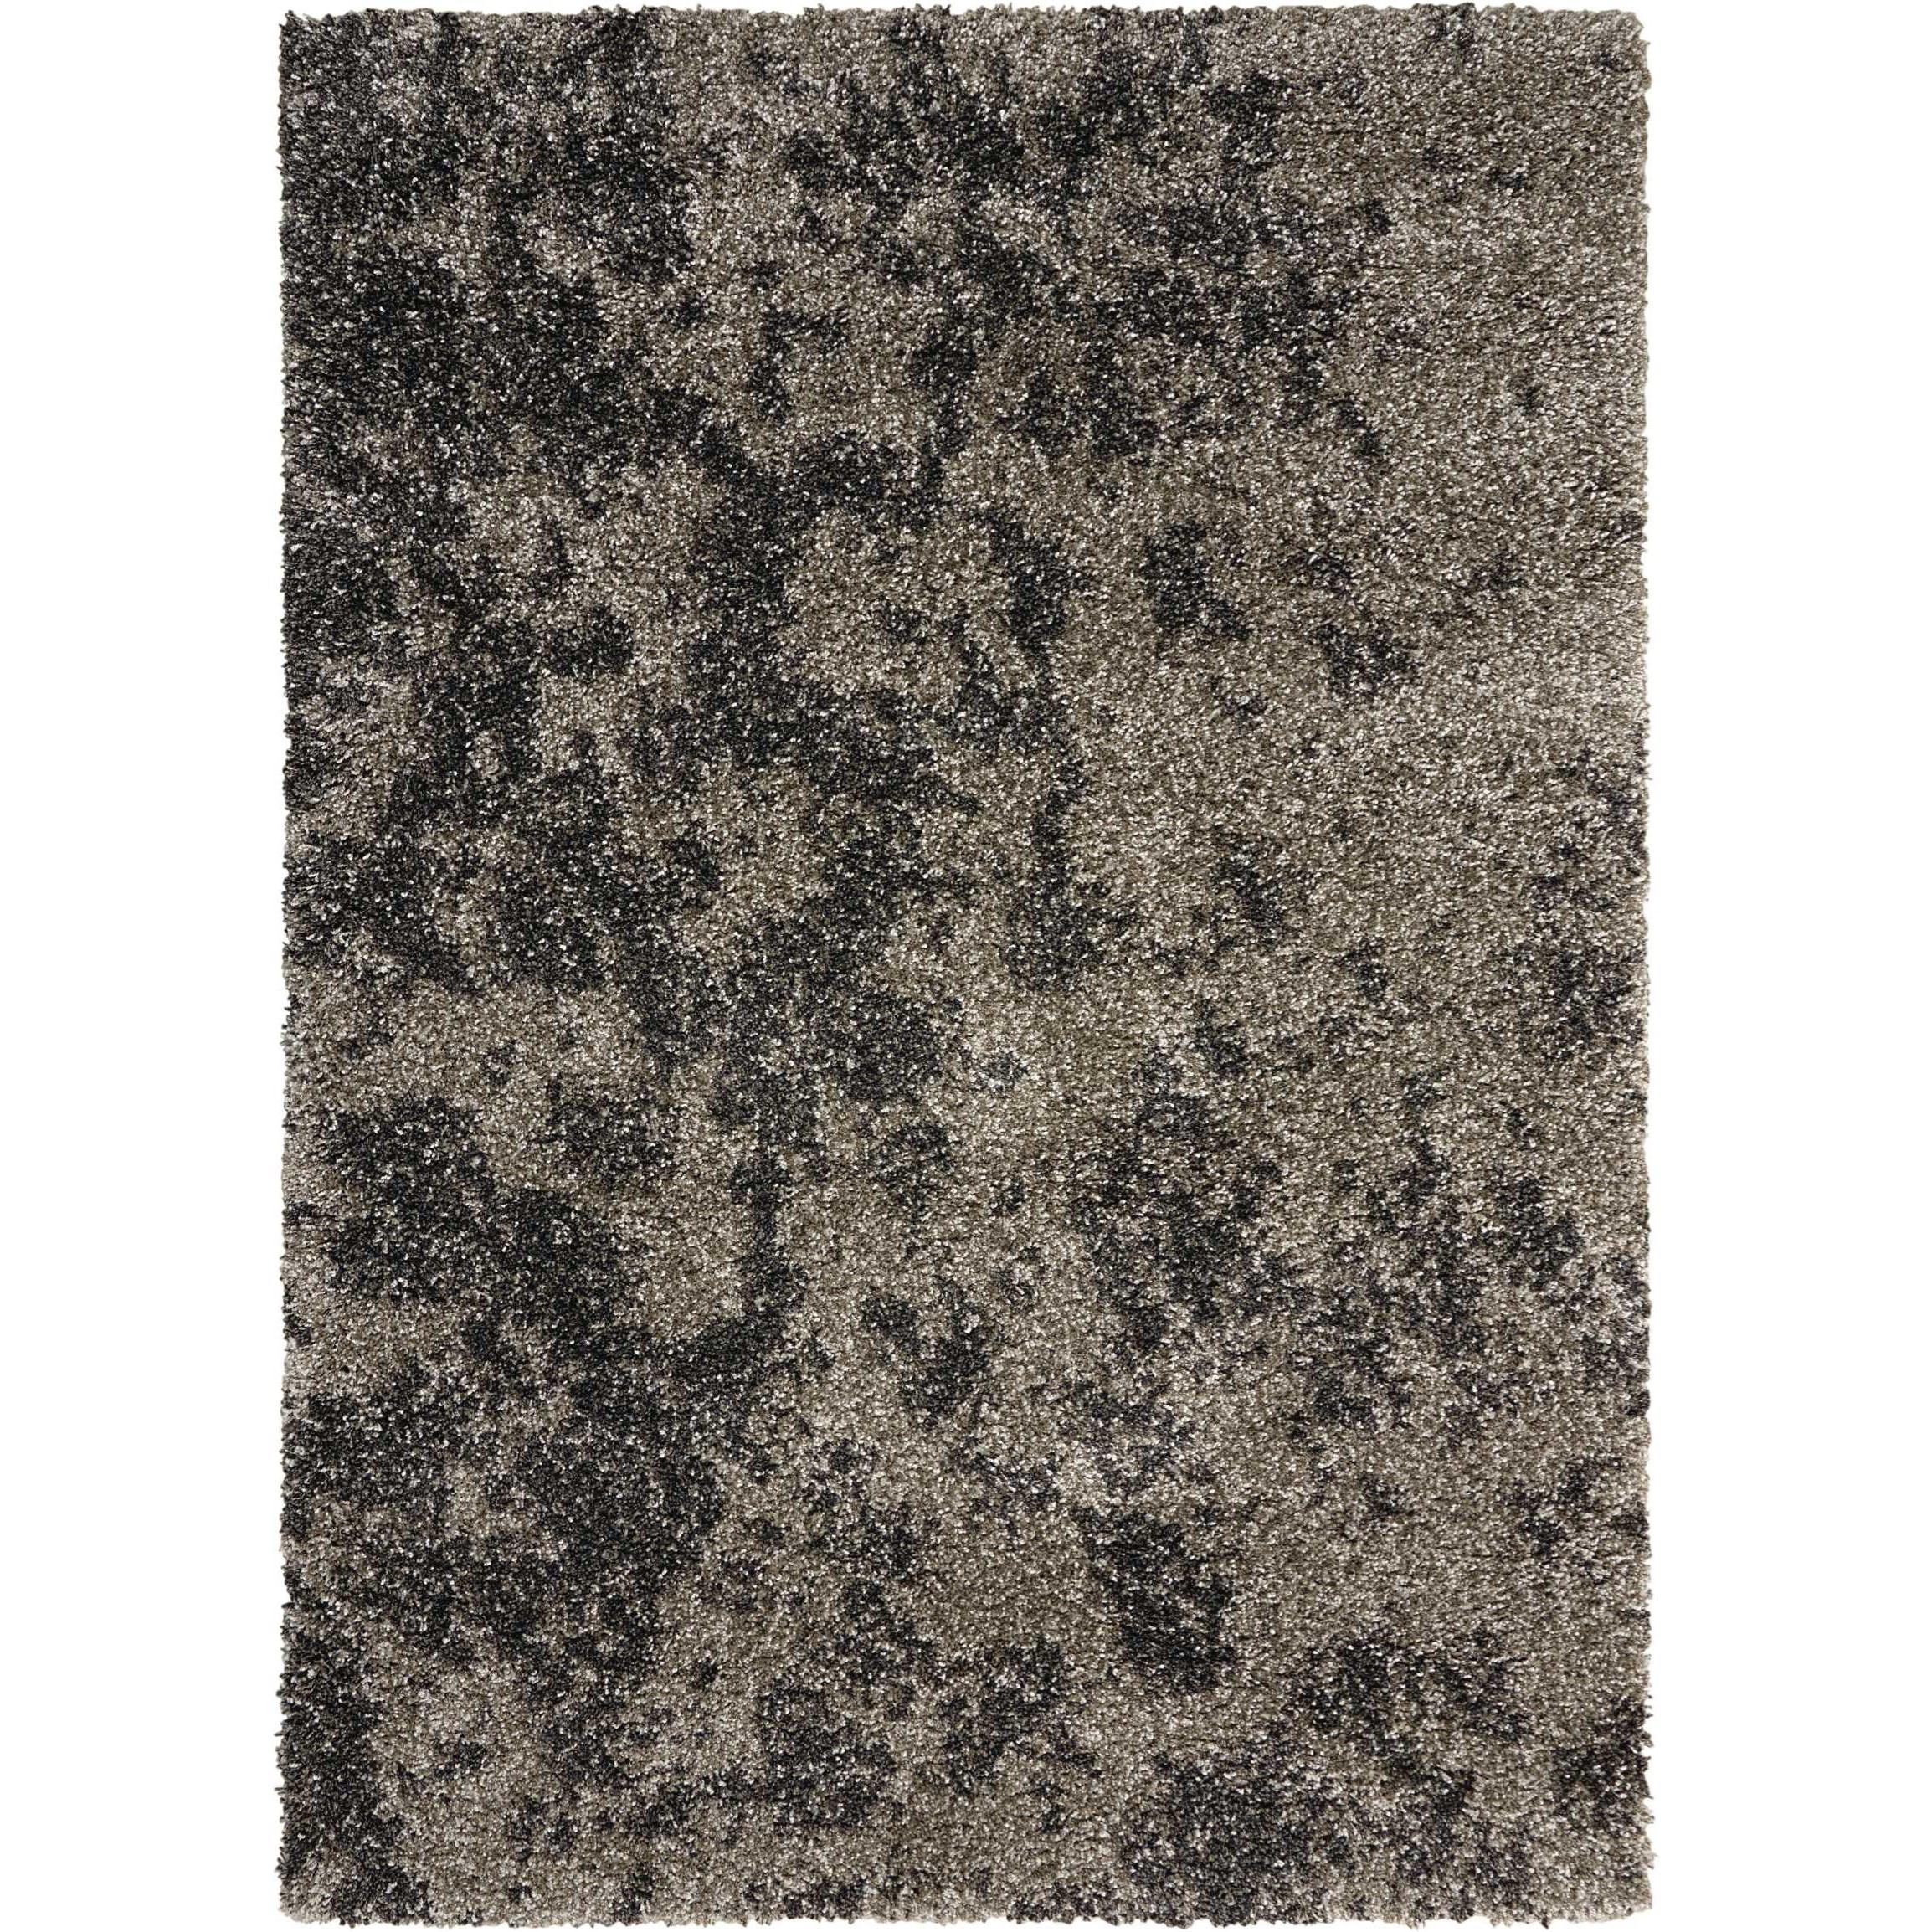 "3'11"" x 5'11"" Granite Rectangle Rug"